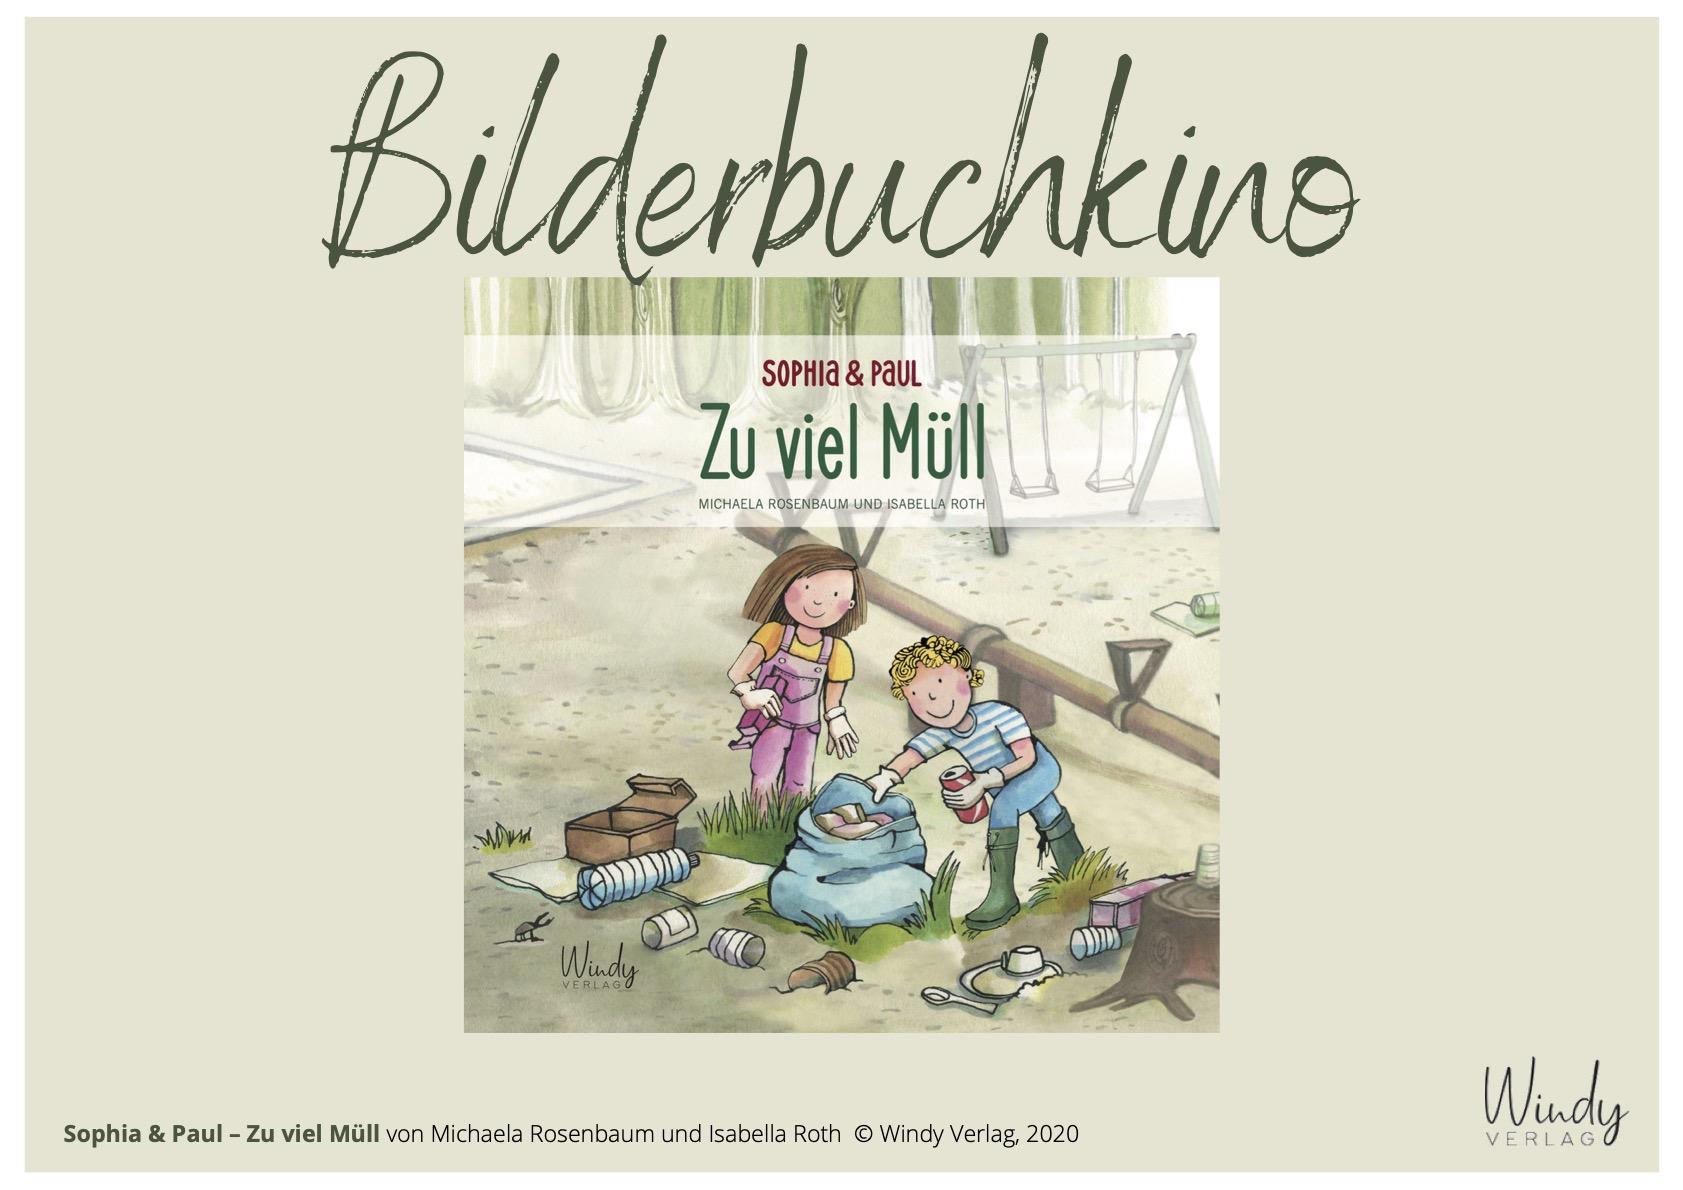 Bilderbuchkino - Sophia & Paul - Zu viel Müll